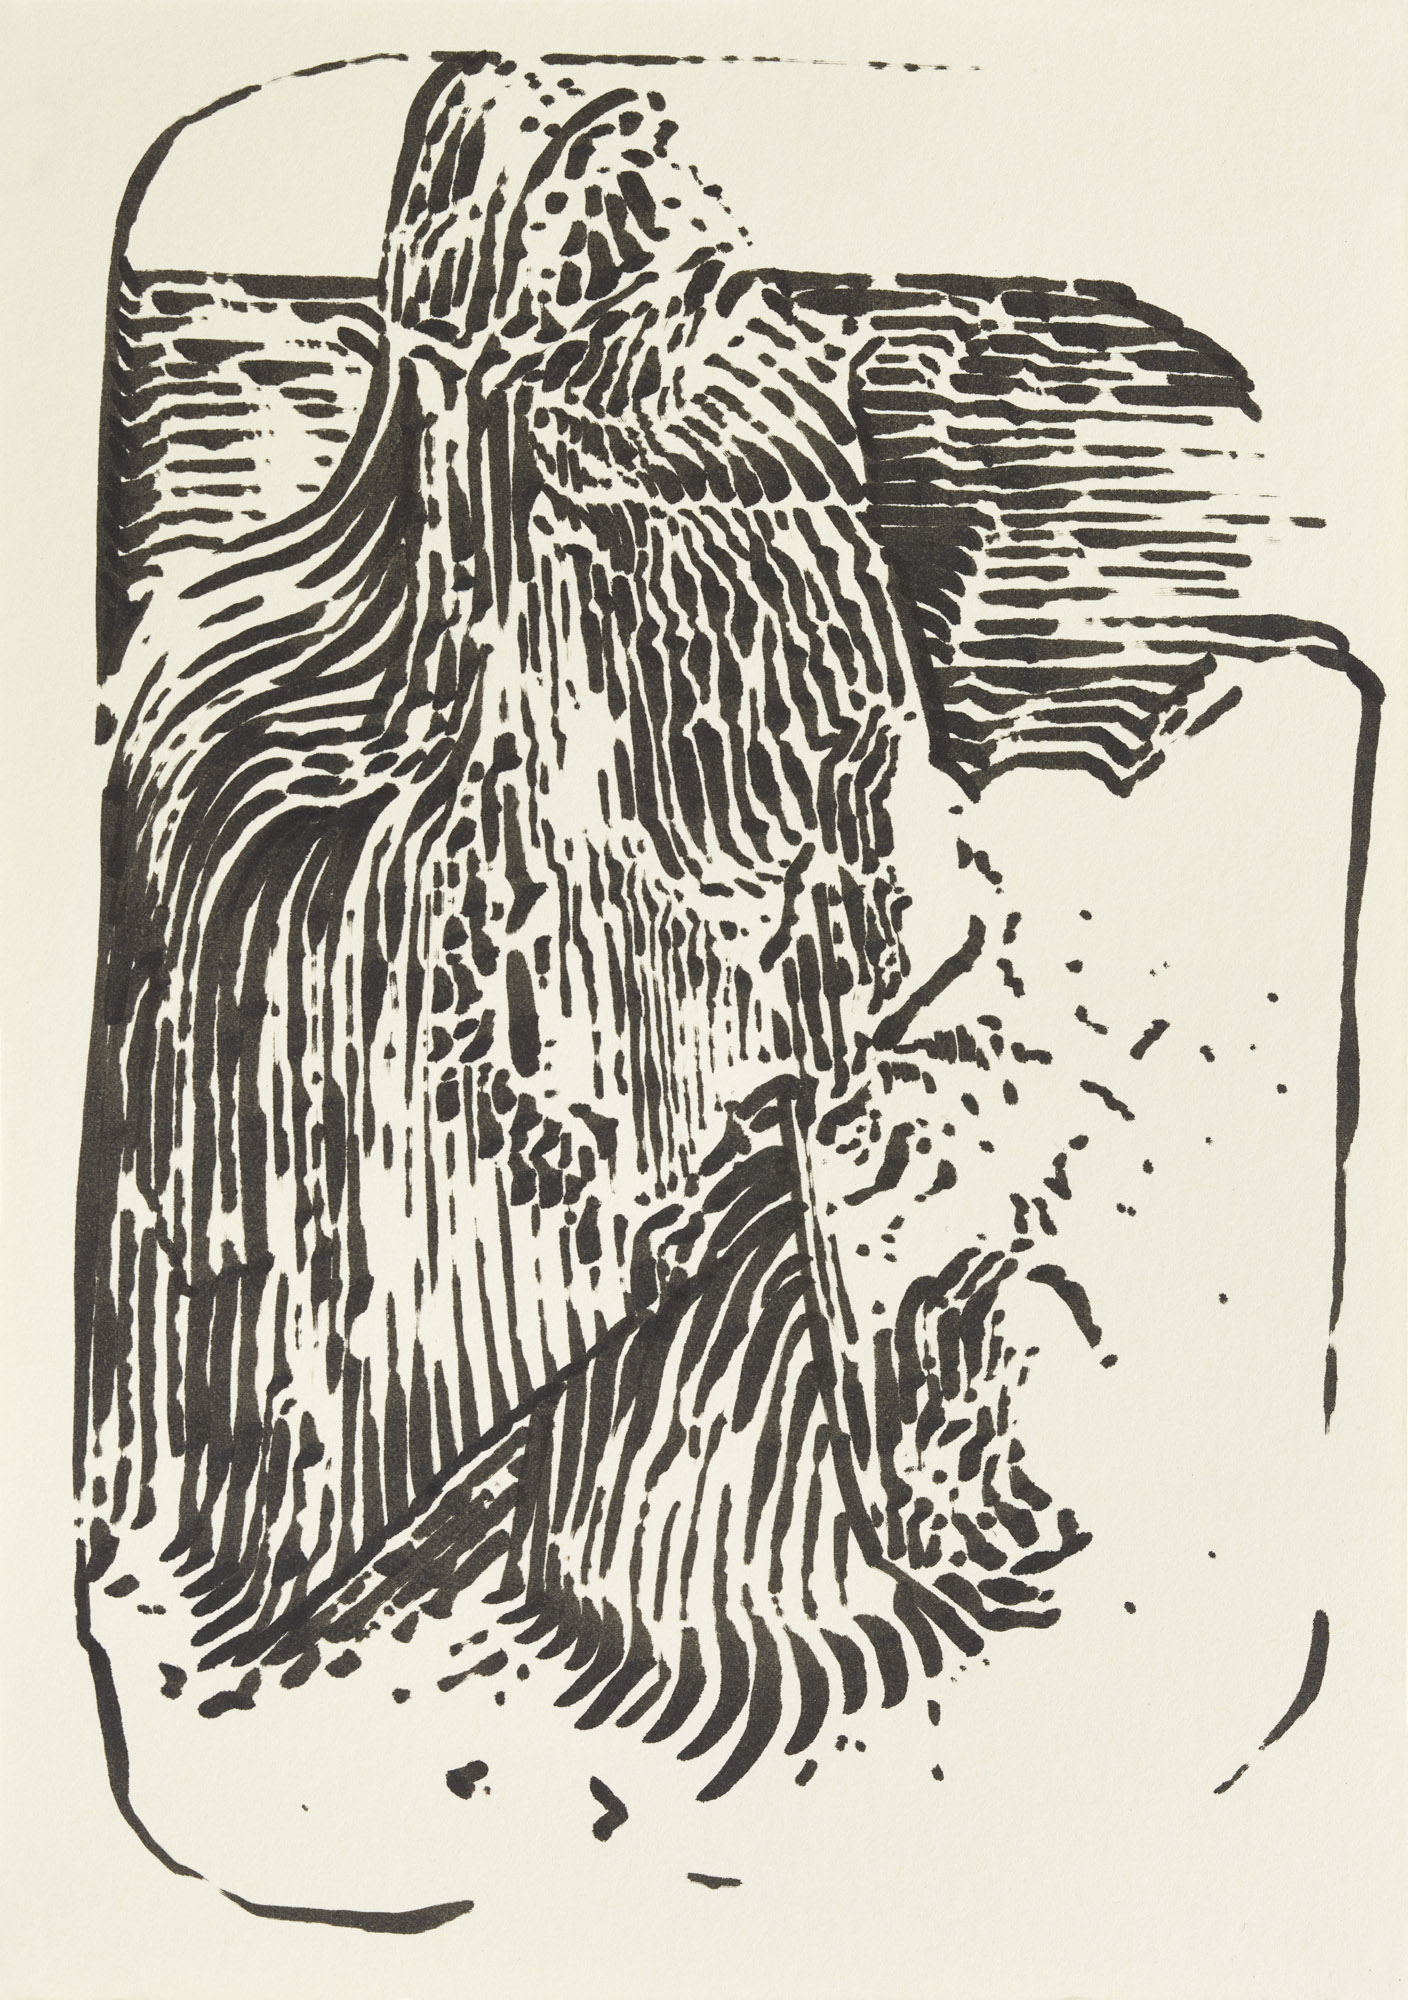 BK P7530 | untitled | ink on paper | 21x15cm | 2015